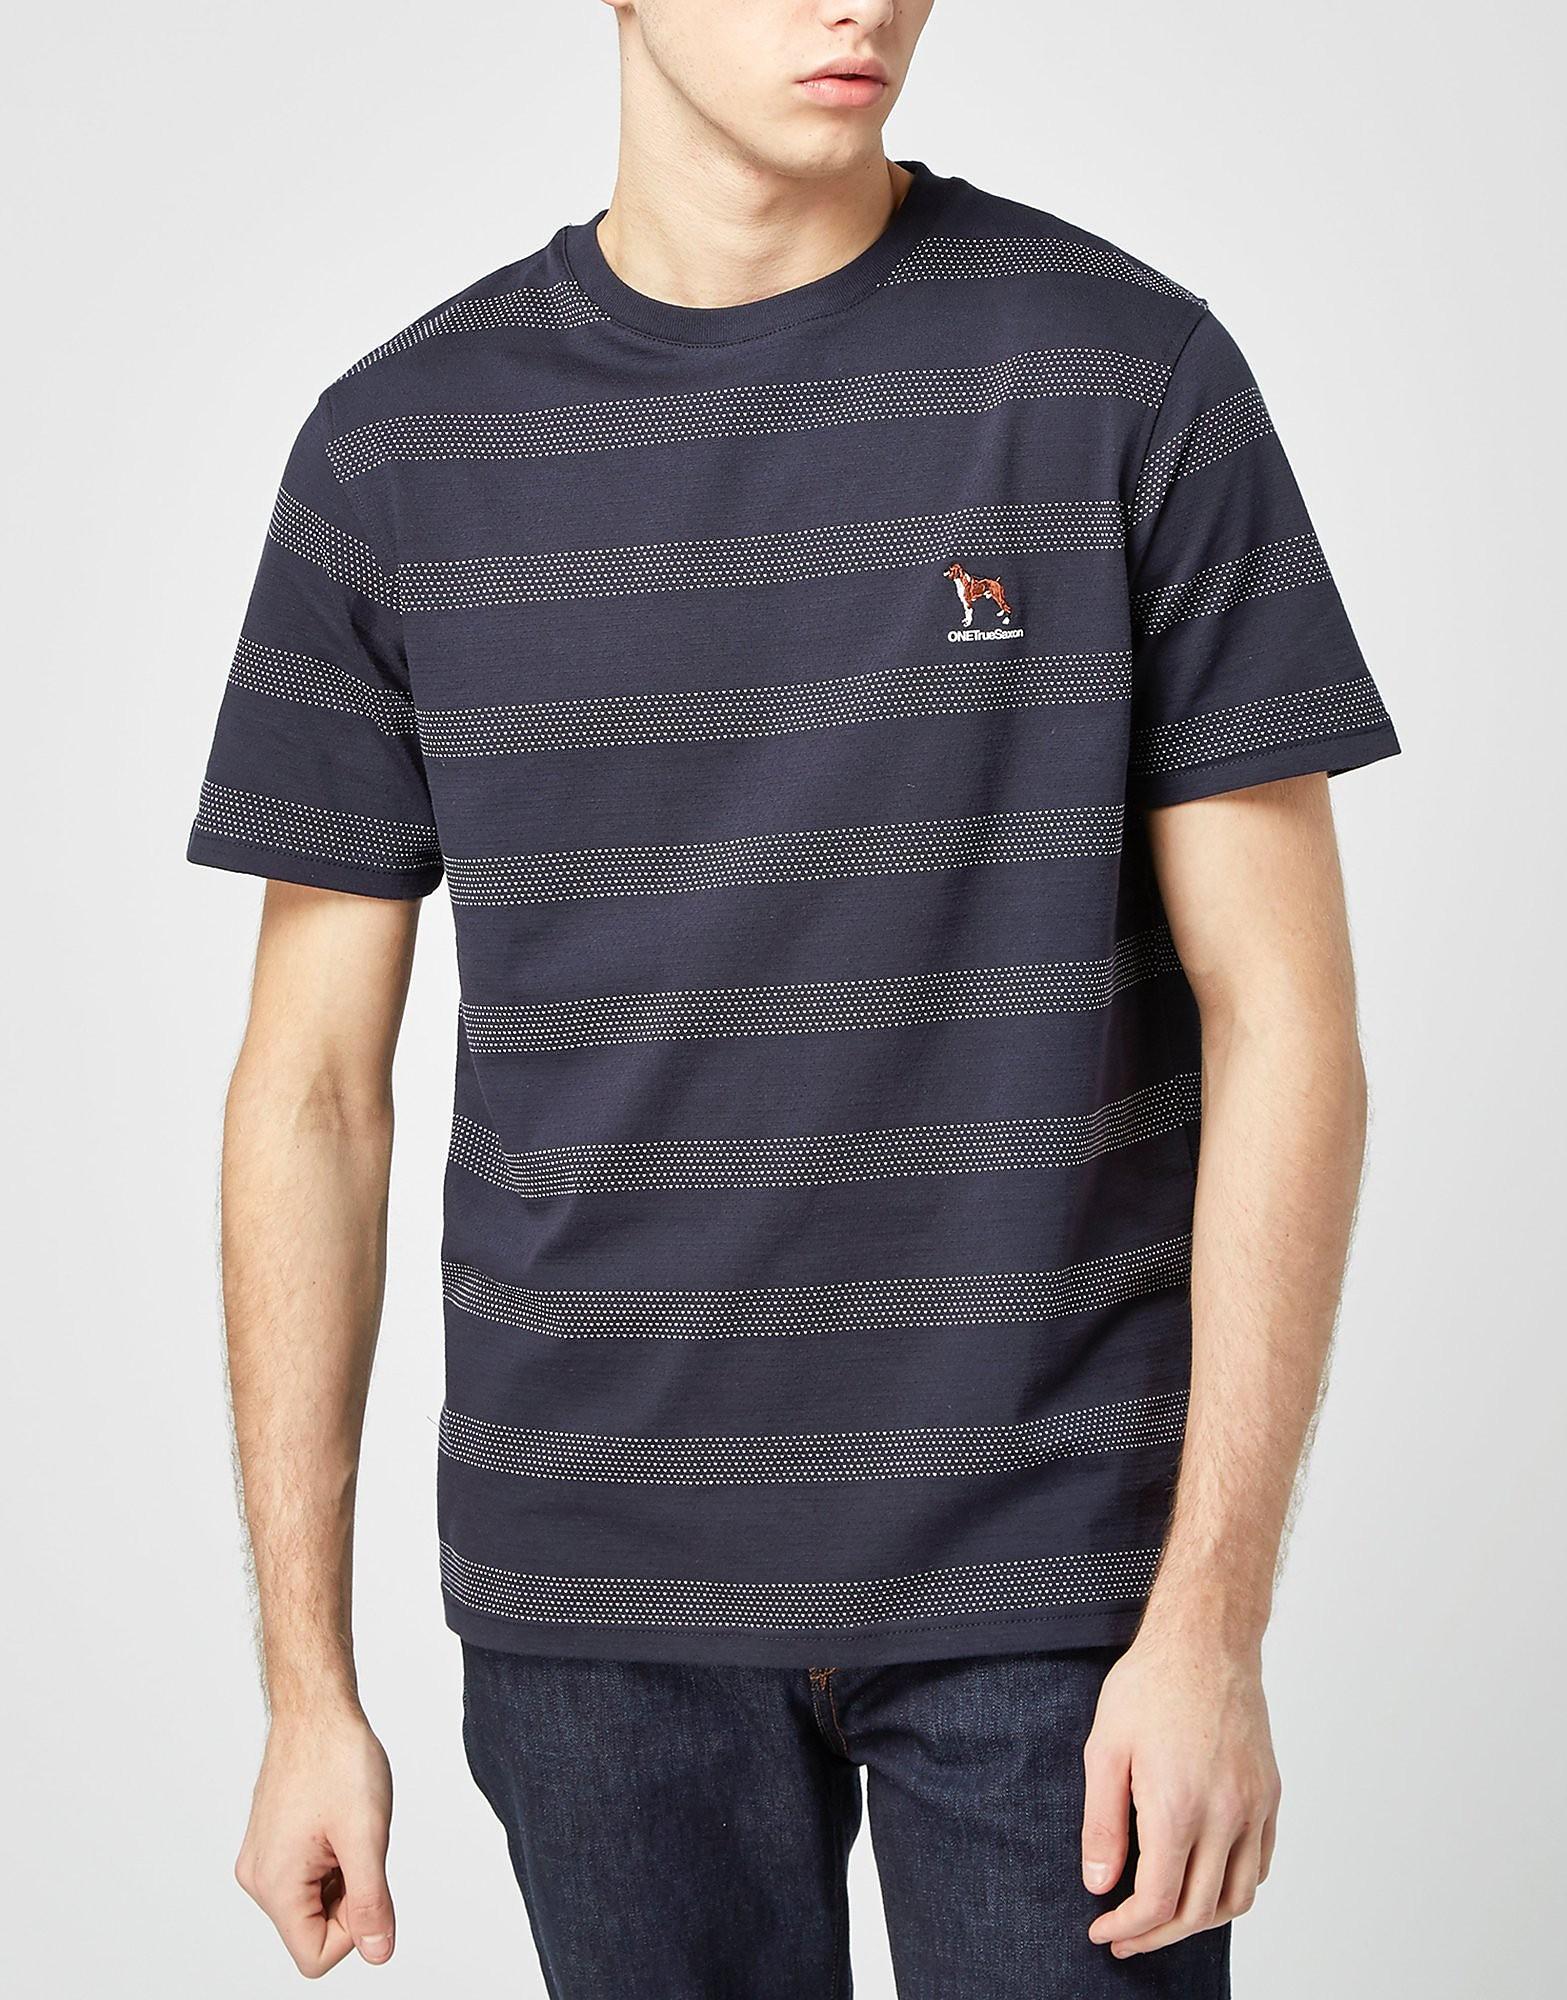 One True Saxon Bradley T-Shirt - Exclusive